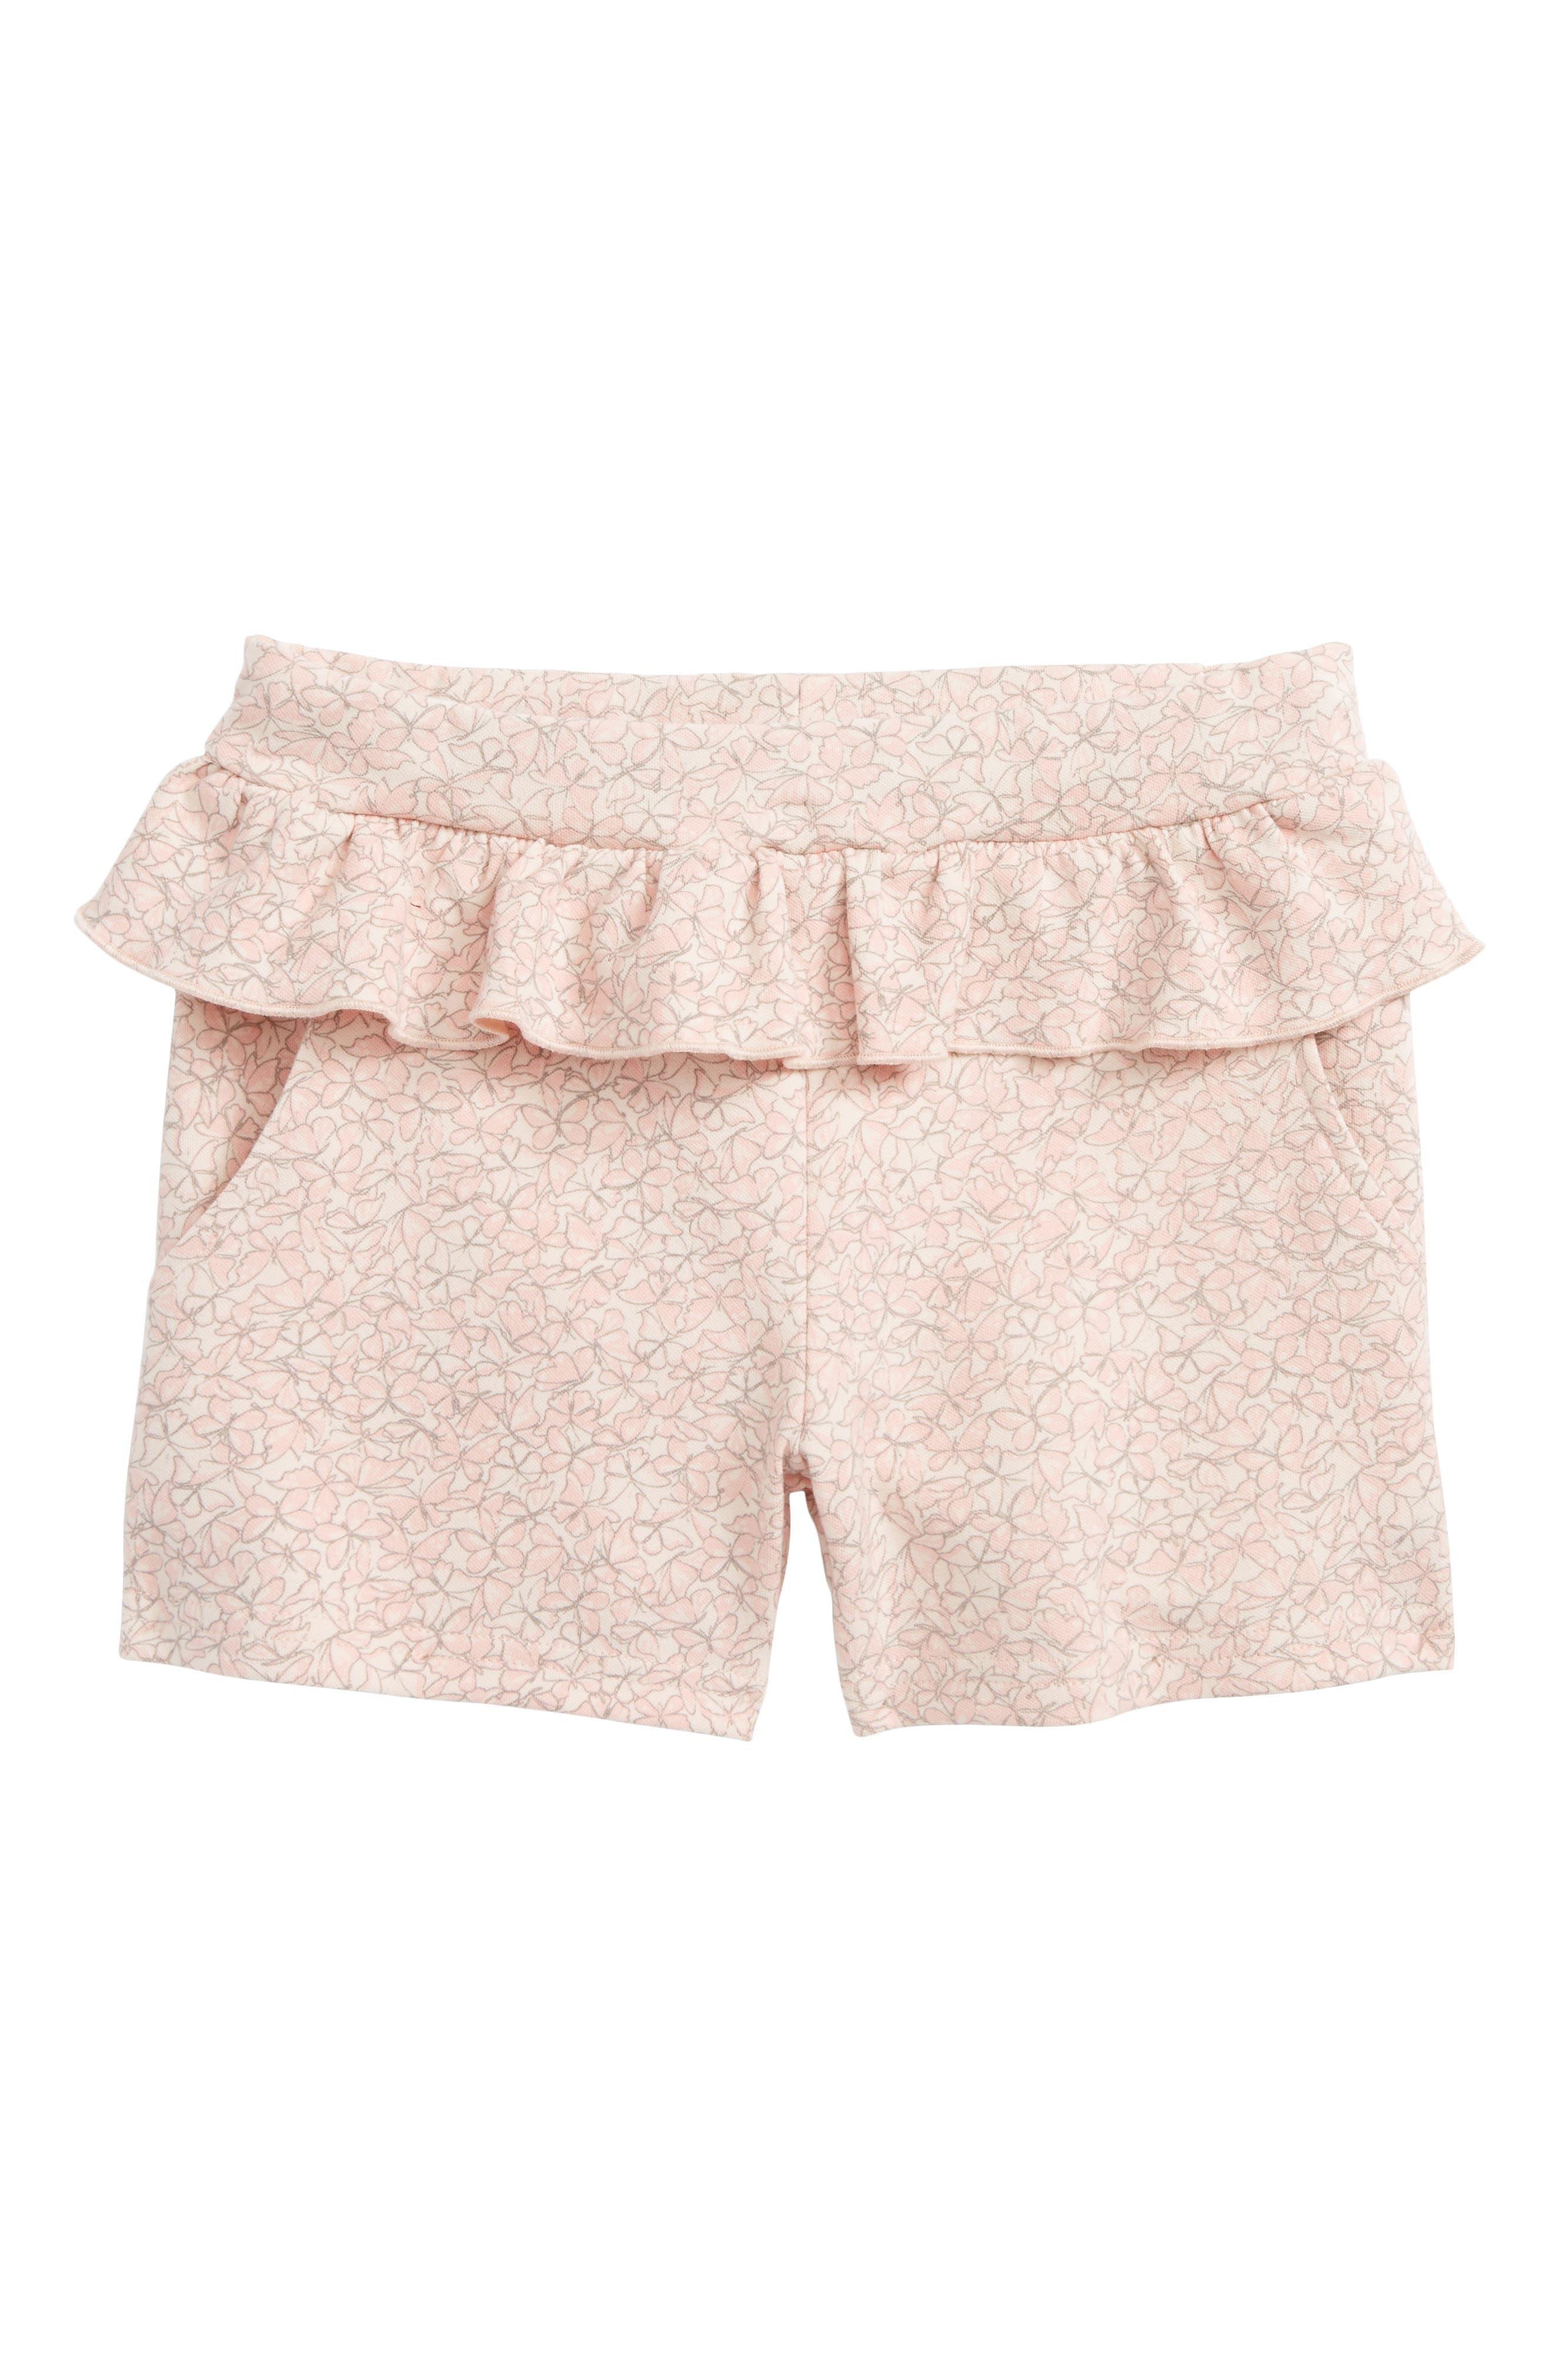 Butterfly Ruffle Shorts,                         Main,                         color, 2400 Powder